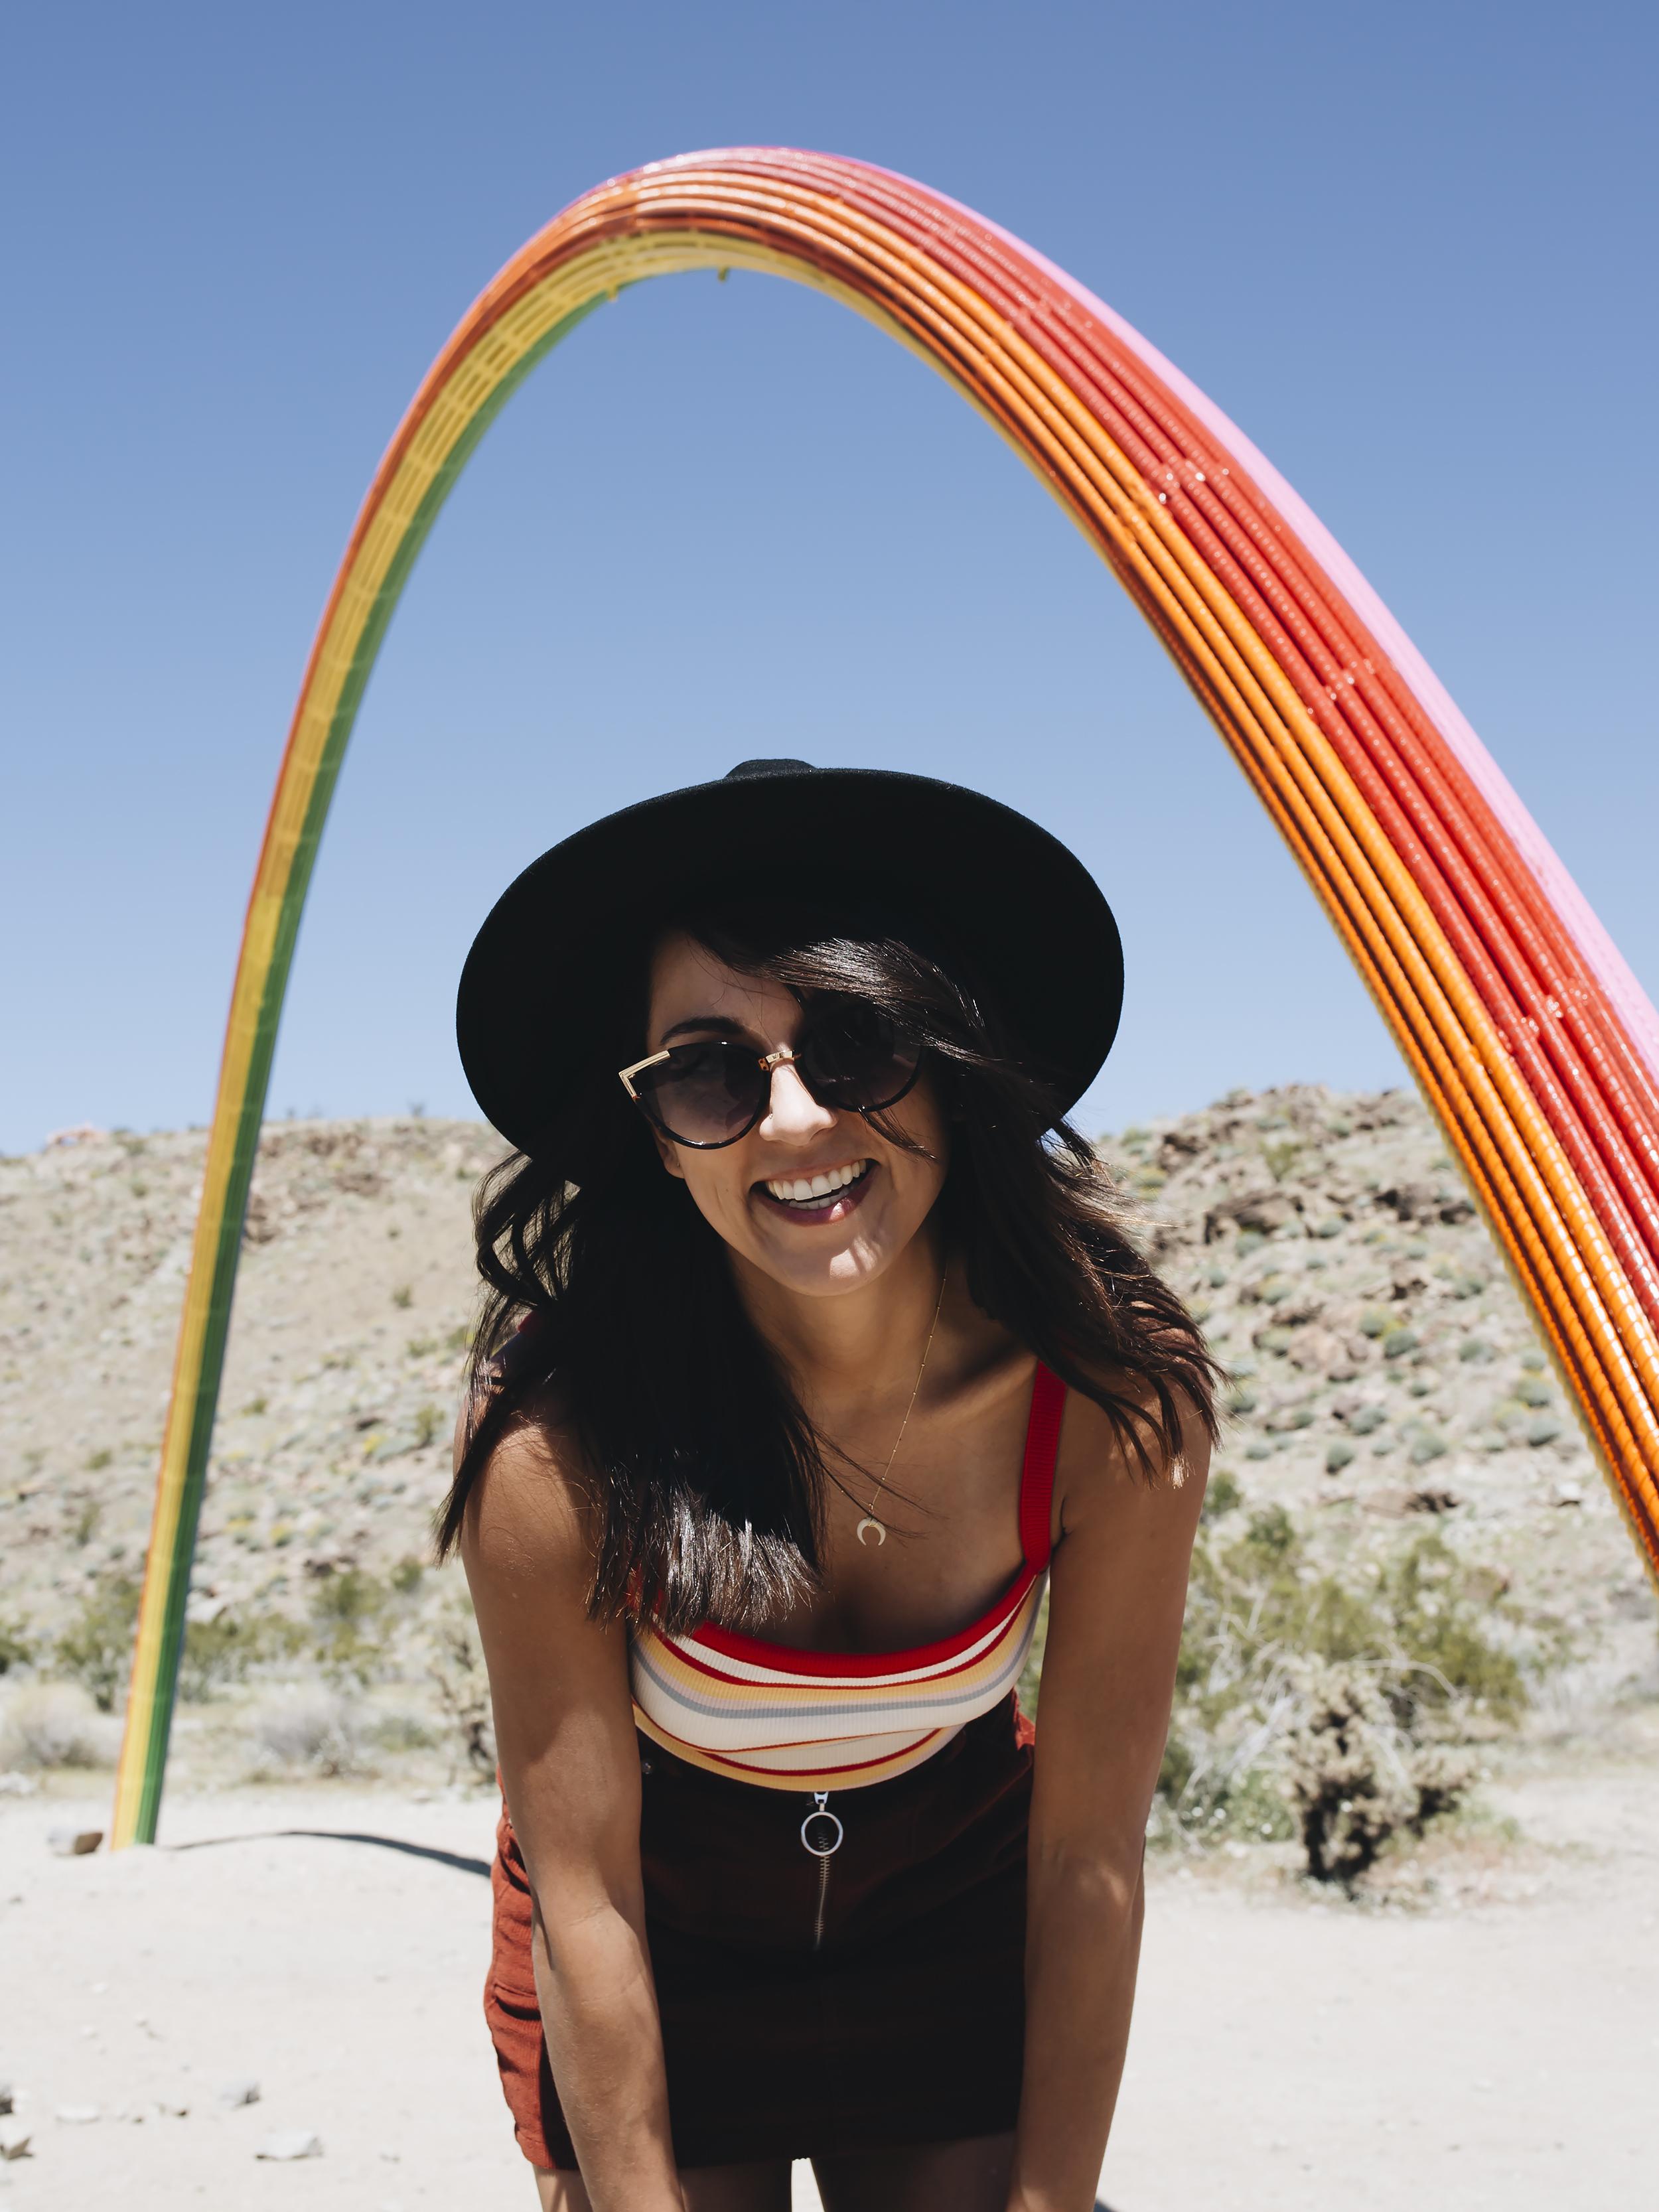 chrissihernandez-california-palmsprings-desertx-loversrainbow (10)copy2500.jpg